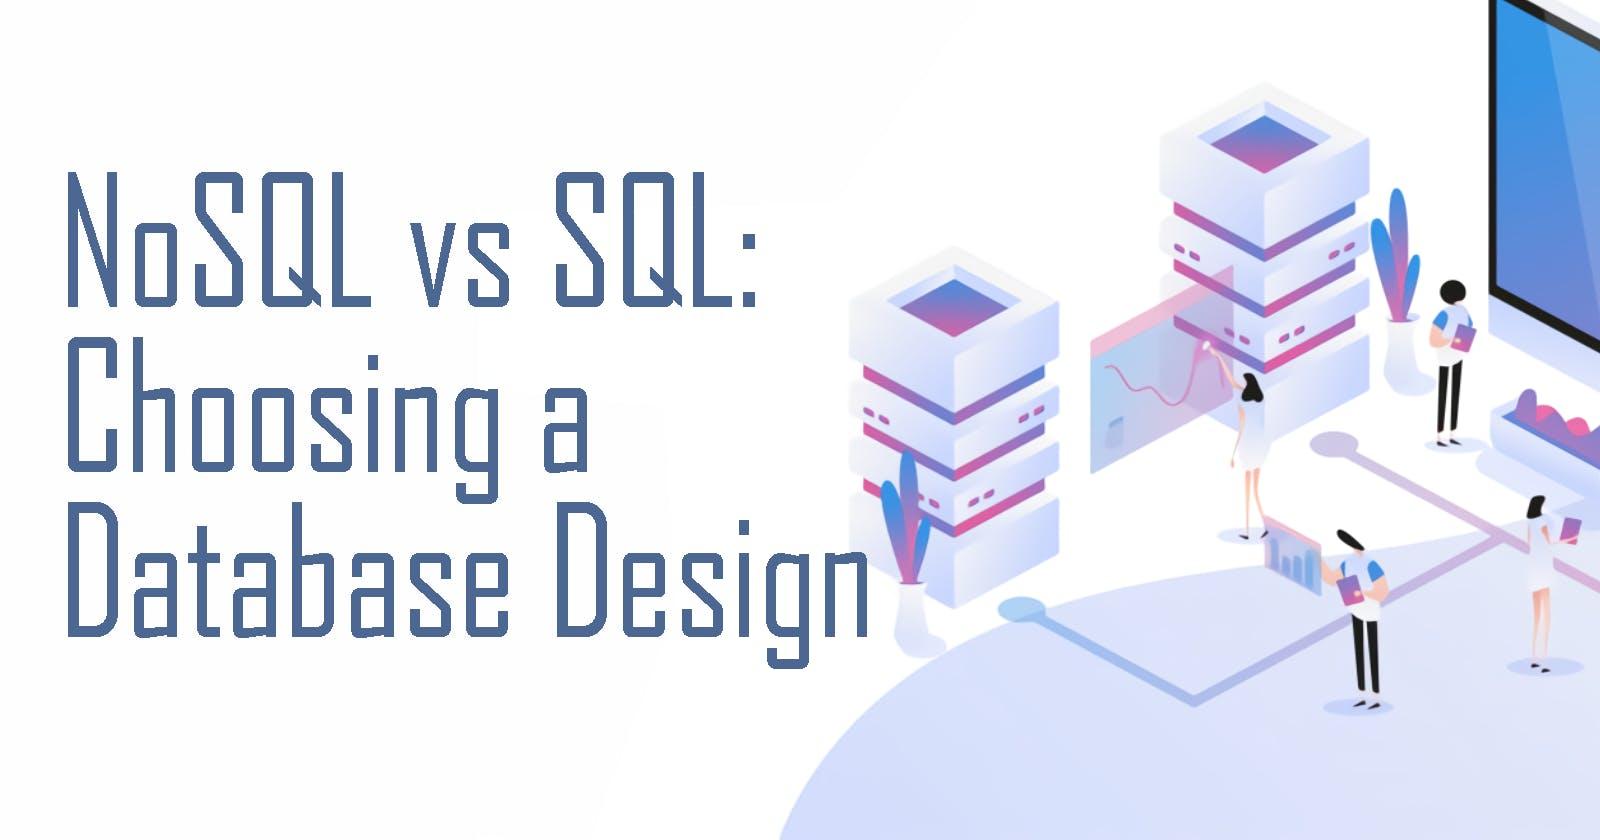 SQL vs NoSQL: Choosing Database Design